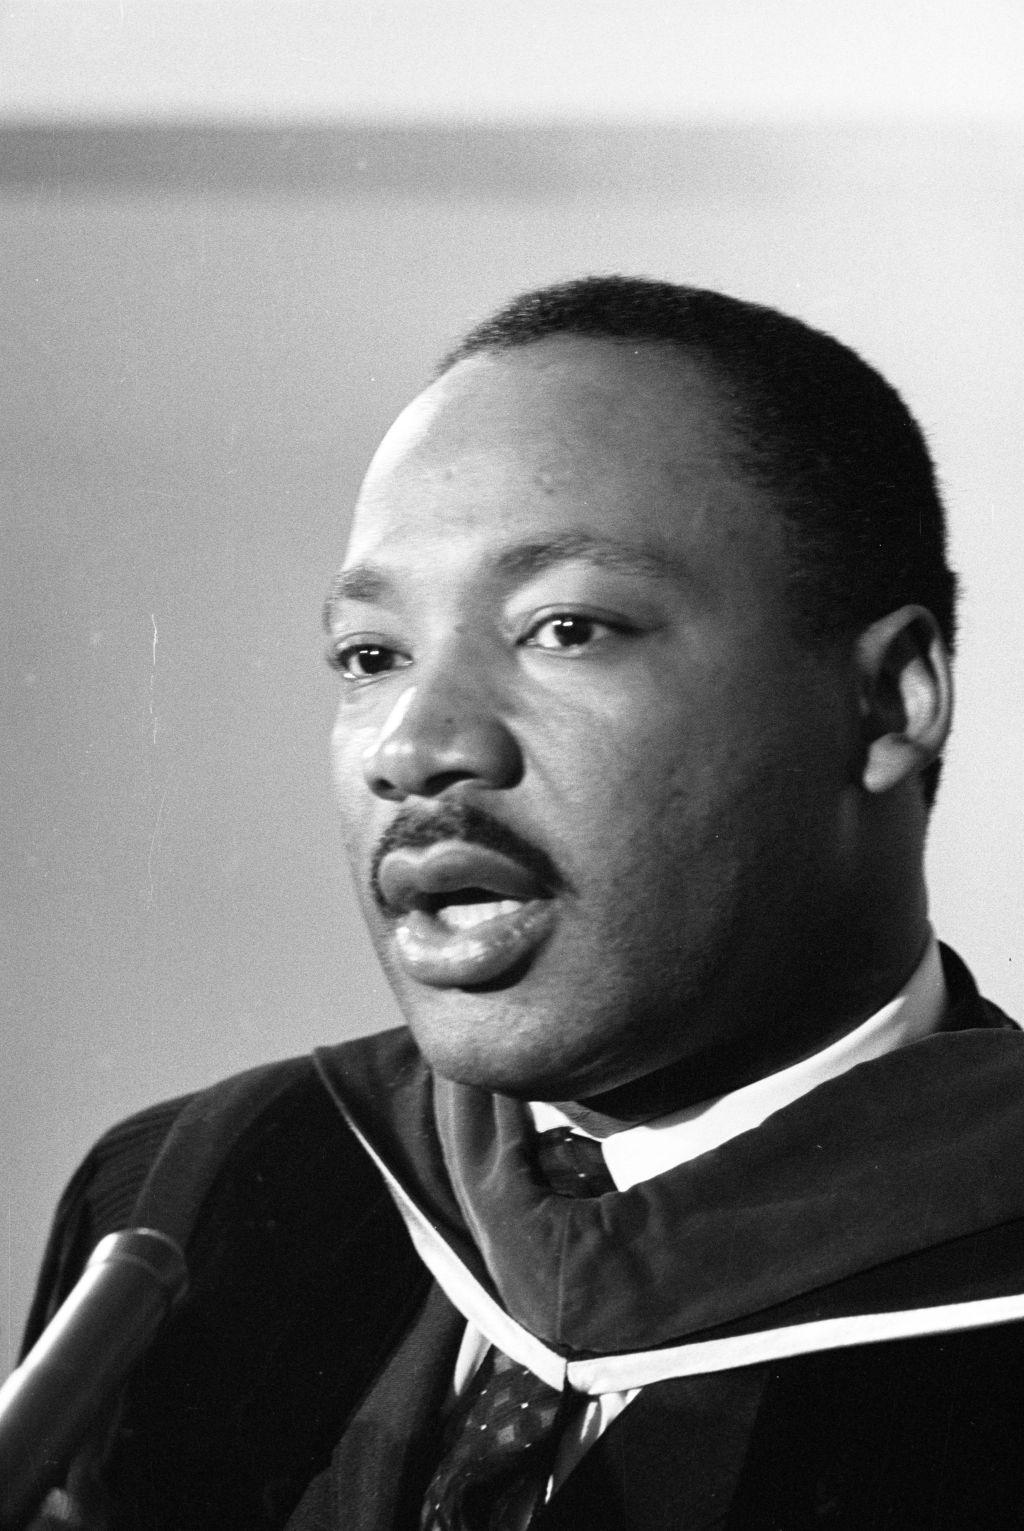 Rev Martin Luther King, Jr